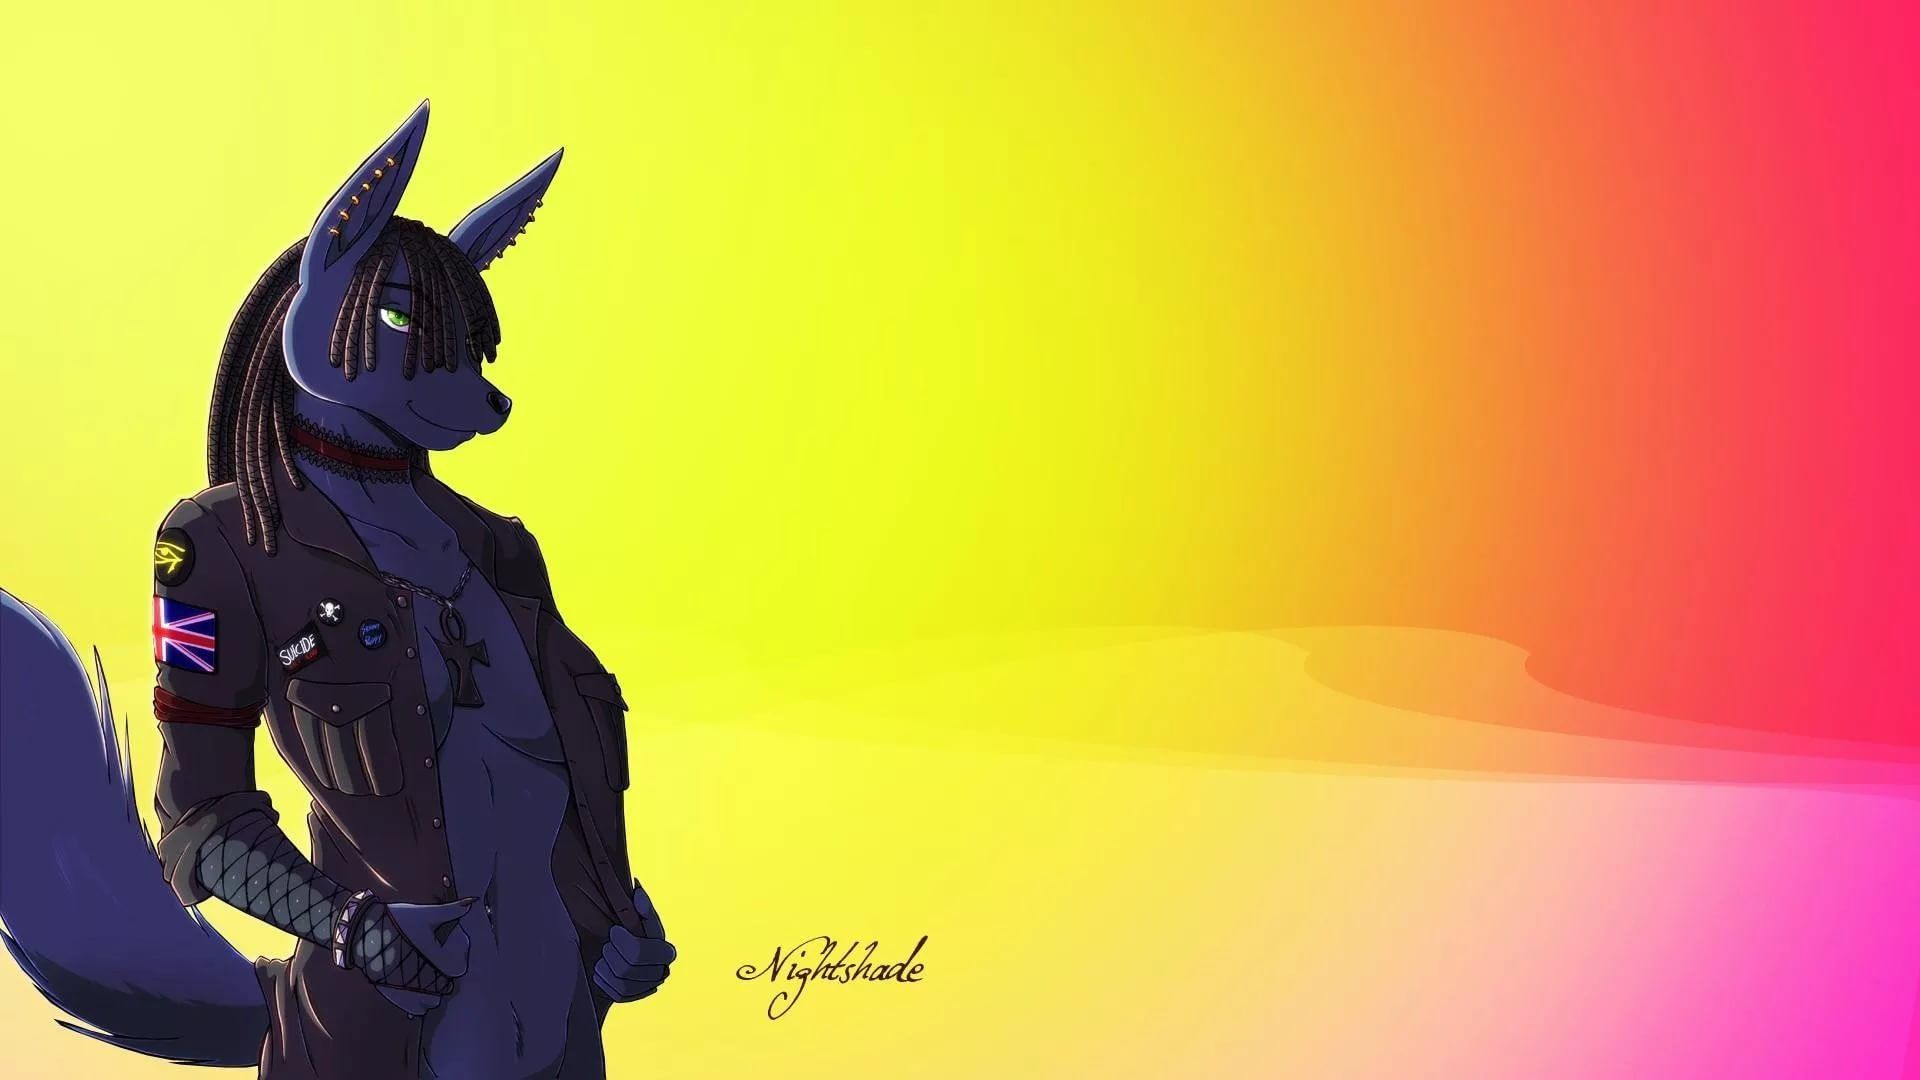 Cool Furry download wallpaper image